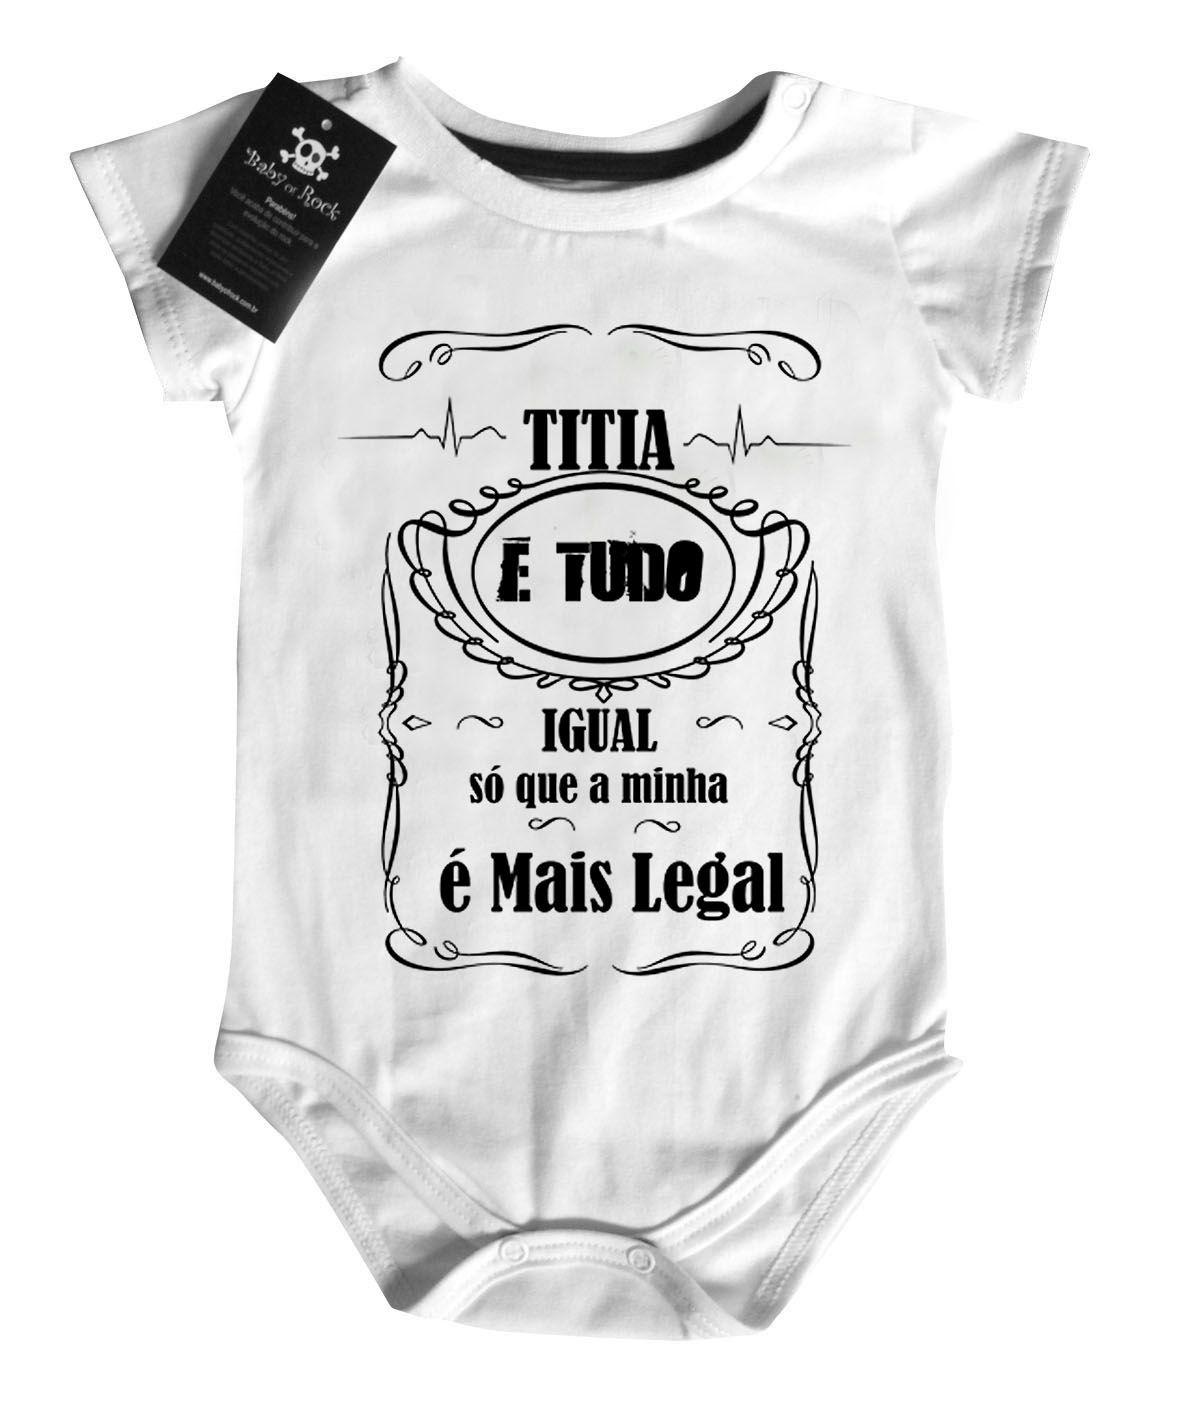 Body Titia e tudo igual  - White  - Baby Monster S/A